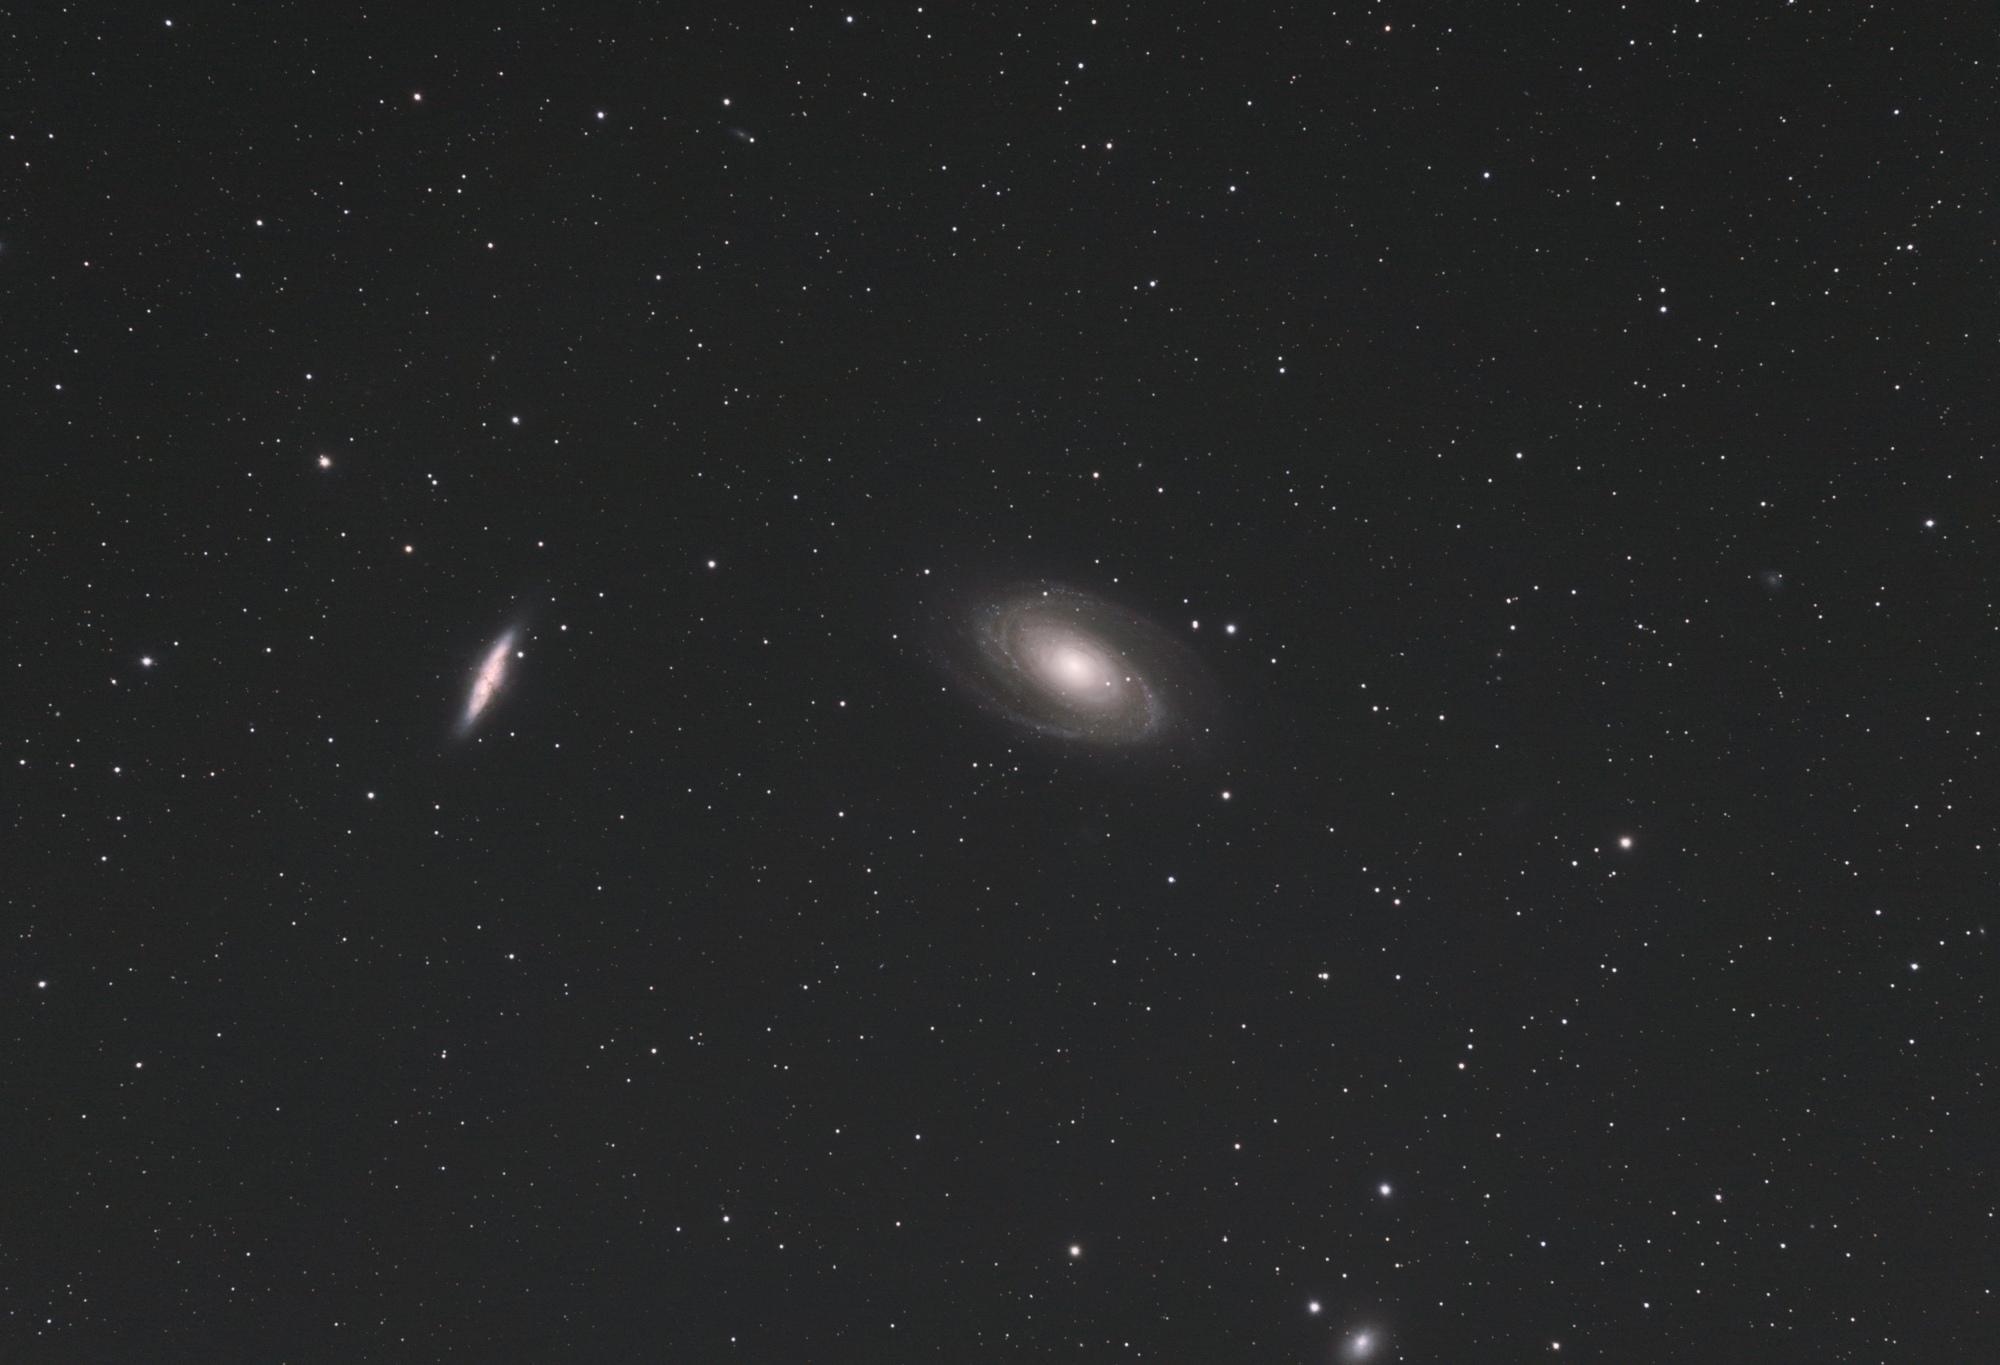 M81&M82_dss1-iris-1-cs5-2-FINAL-6.jpg